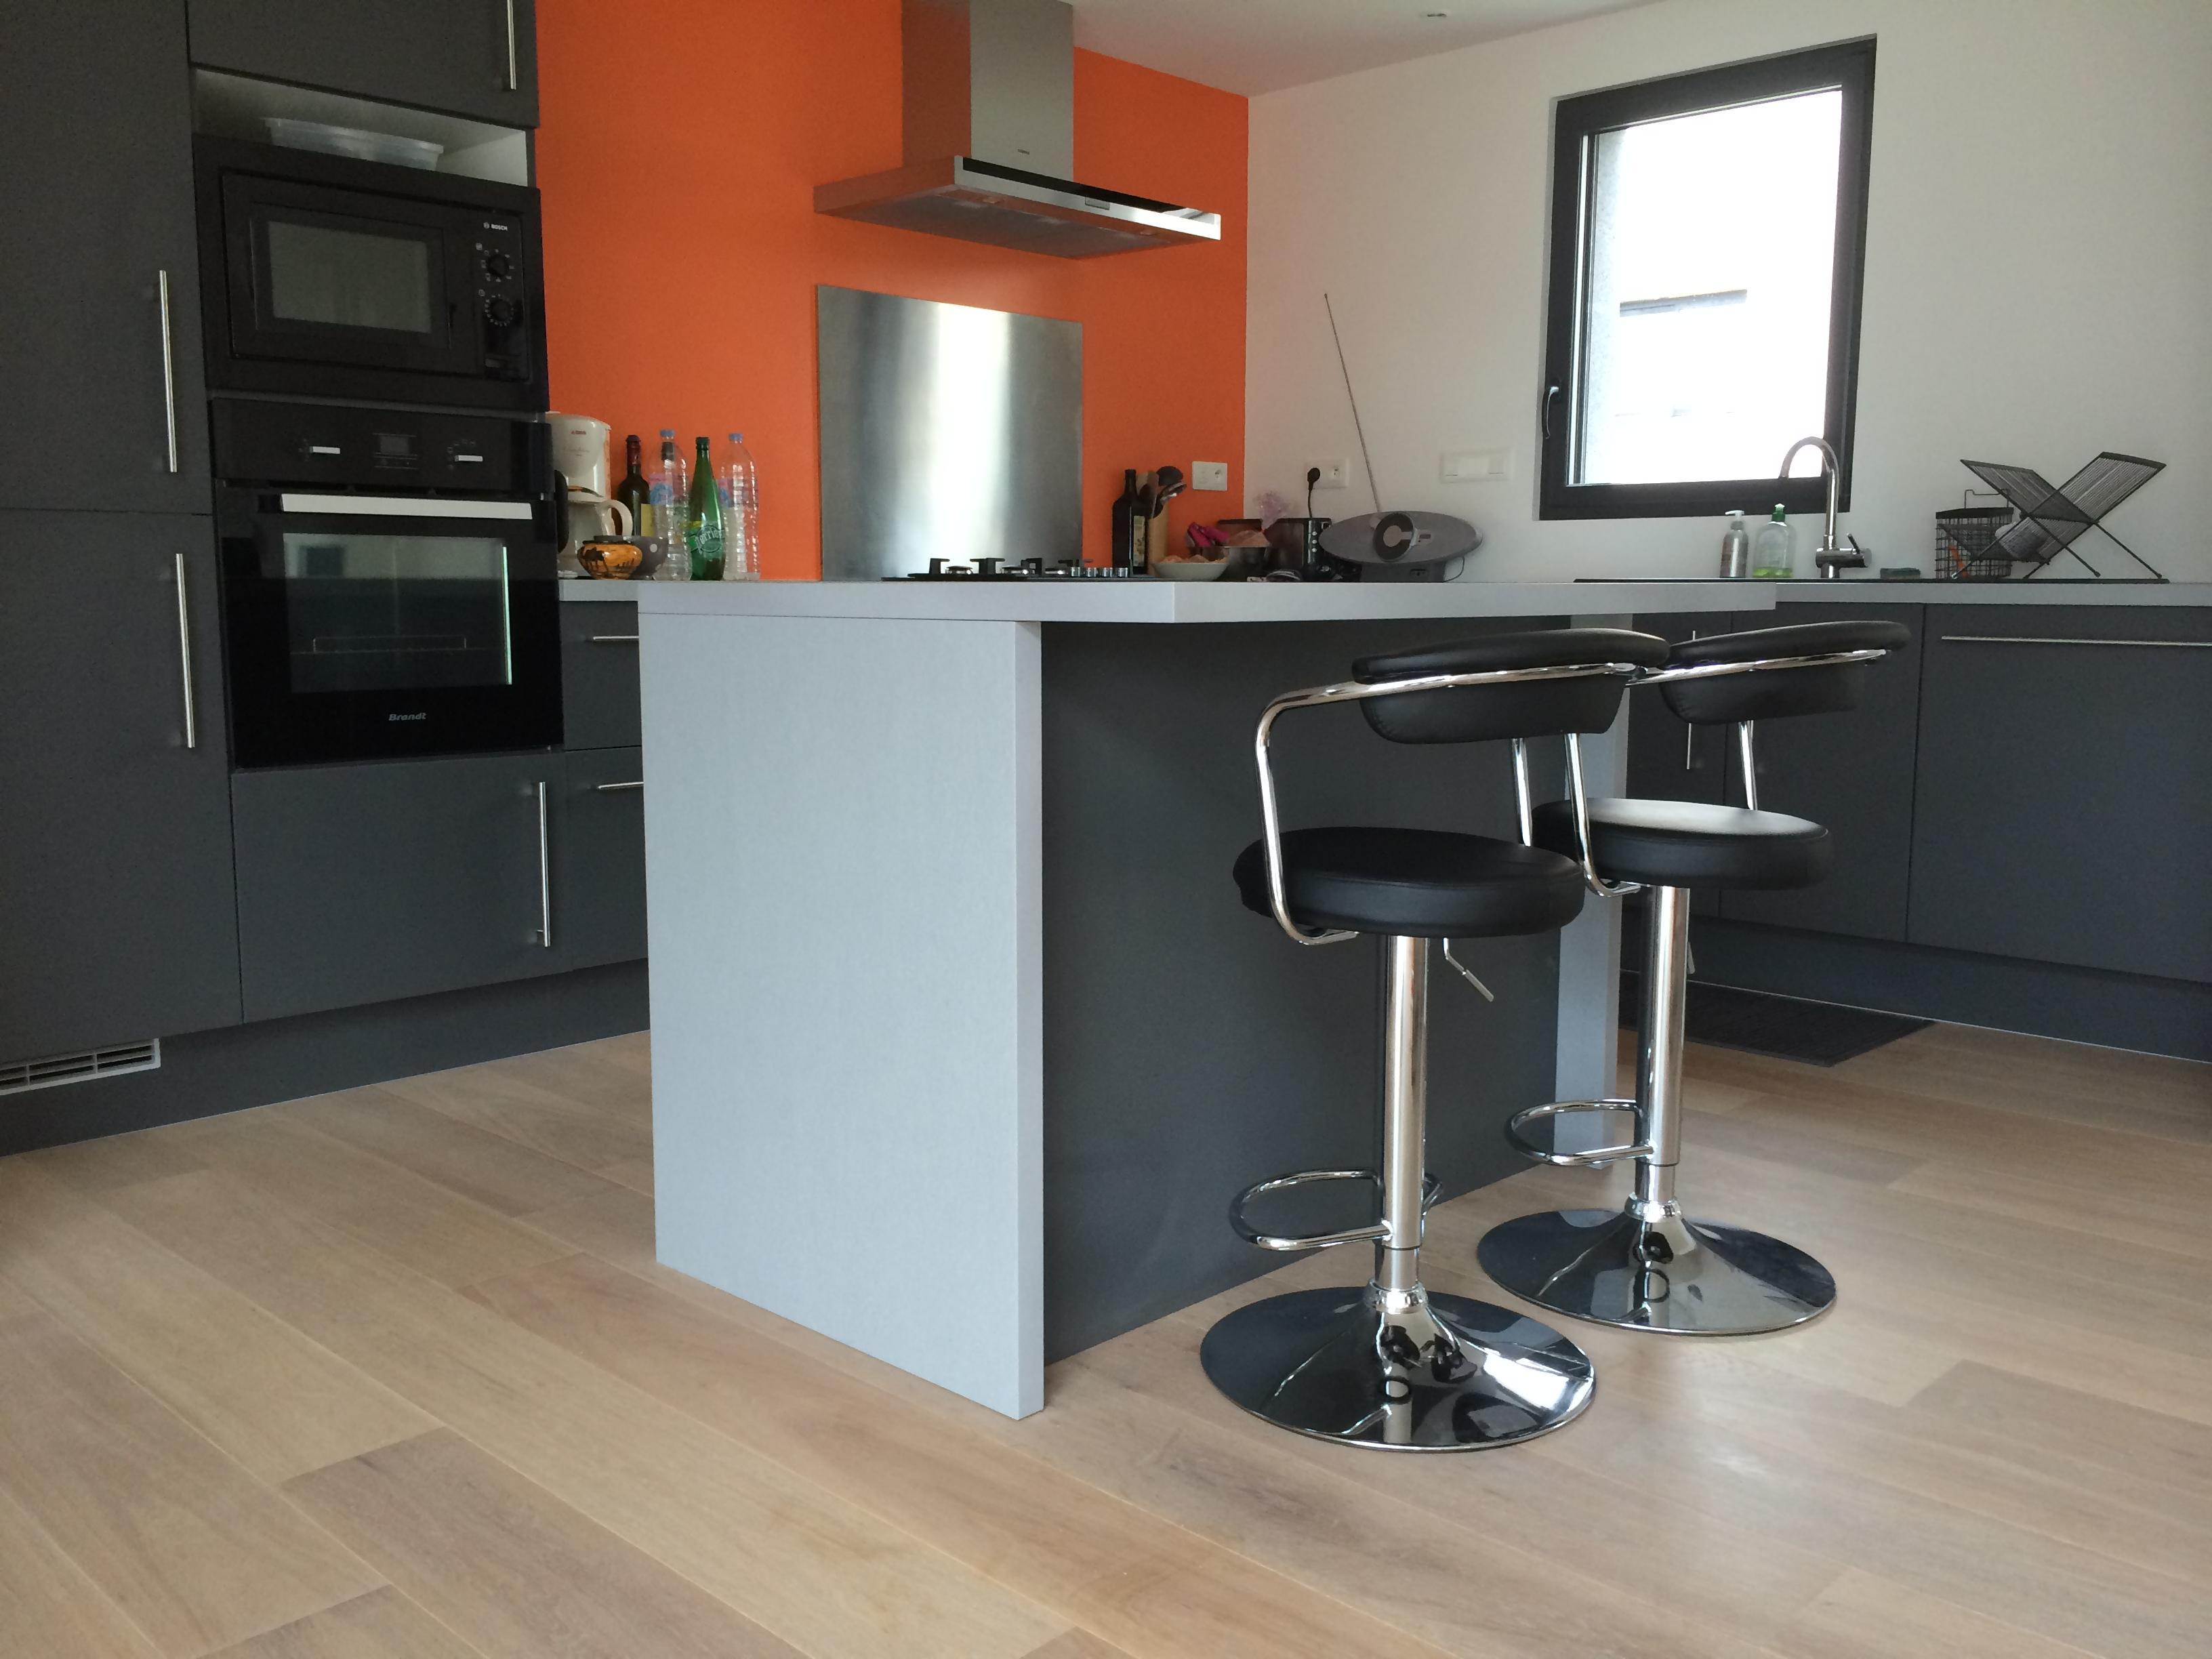 parquet parql49 batistock magasin d coration et bricolage passy. Black Bedroom Furniture Sets. Home Design Ideas